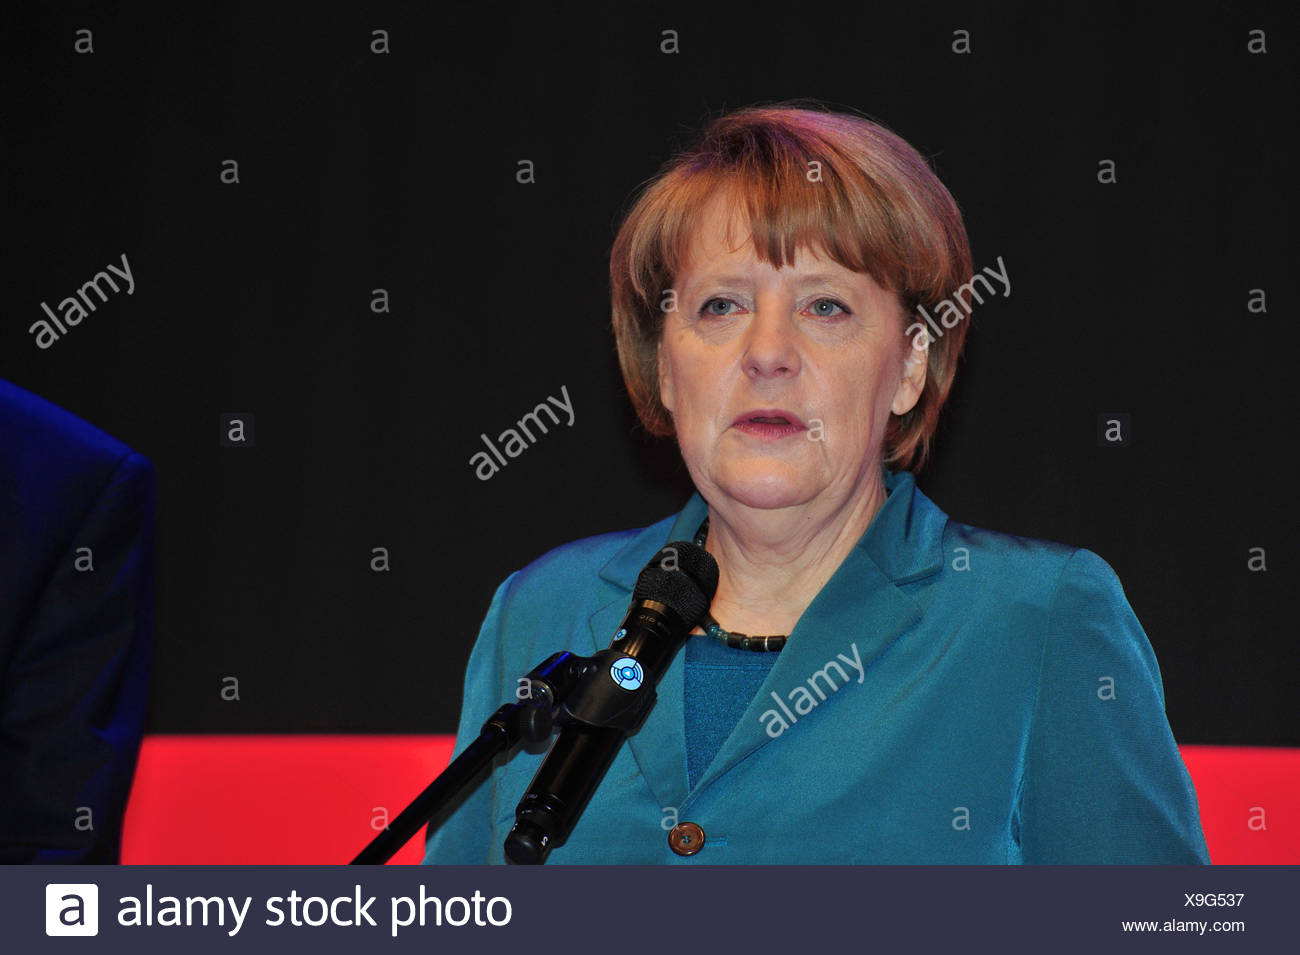 Kanzlerin Angela Merkel - Stock Image